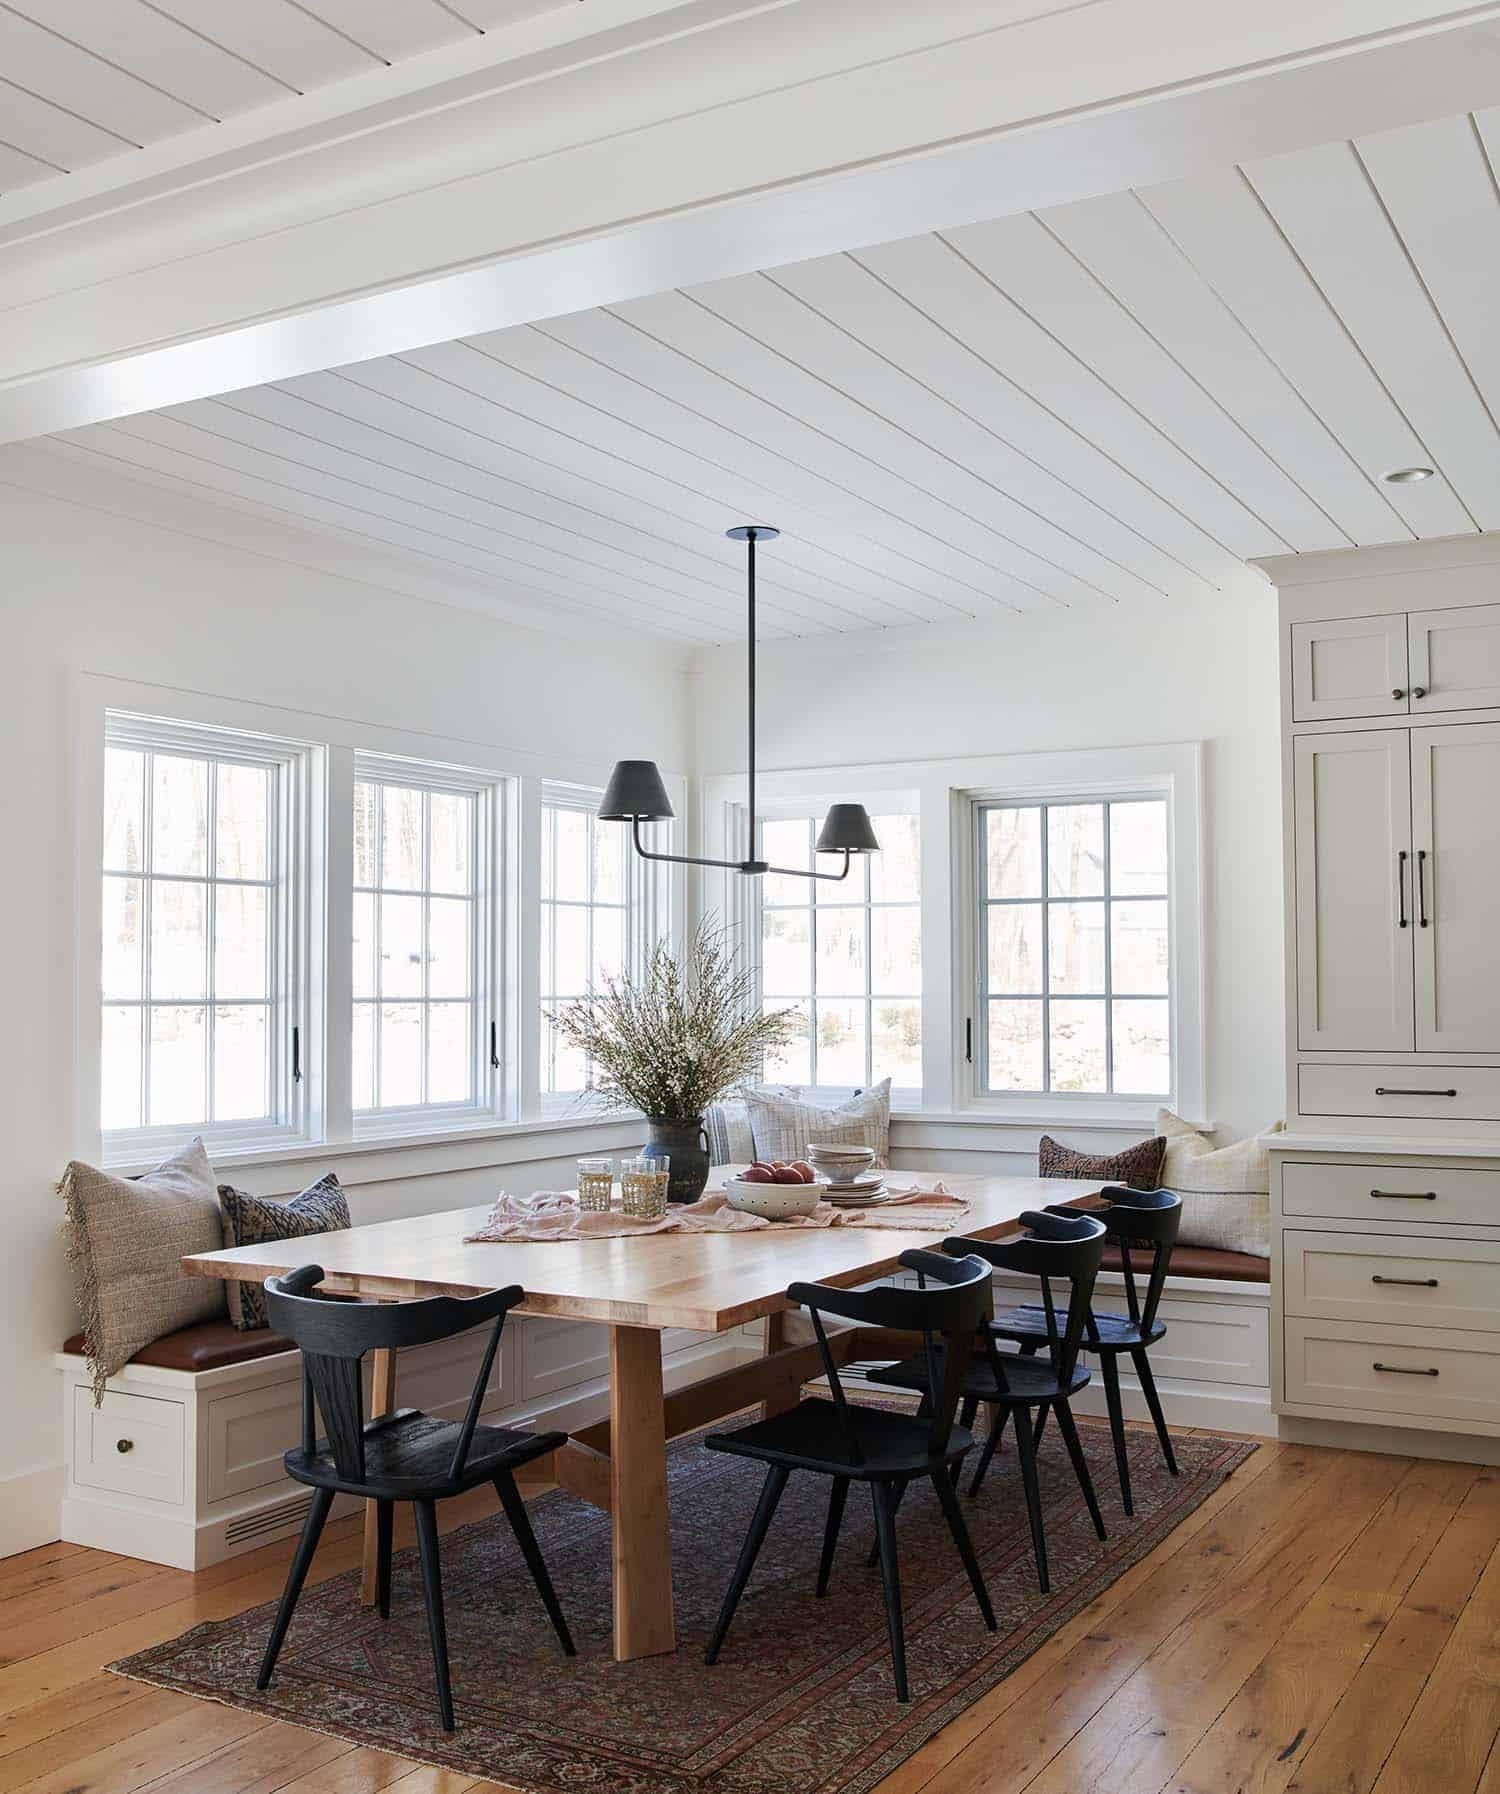 traditional-modern-kitchen-breakfast-nook-dream-house